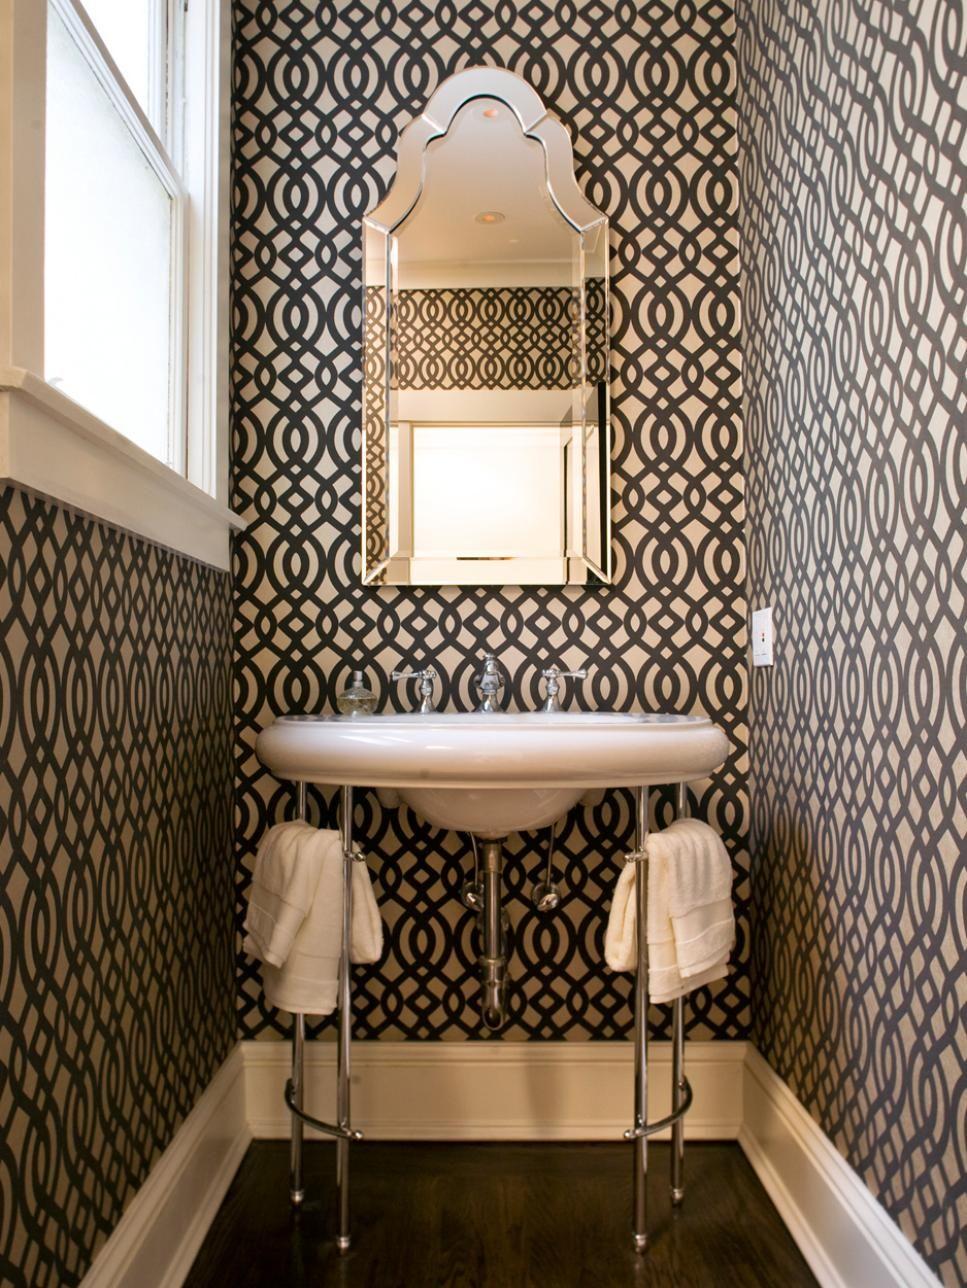 Images On Arabesque Tiles Limestone Tops Kohler Kathryn sink brass worldmarket mirror Jessica Conner Design u Interiors Pinterest Arabesque P u